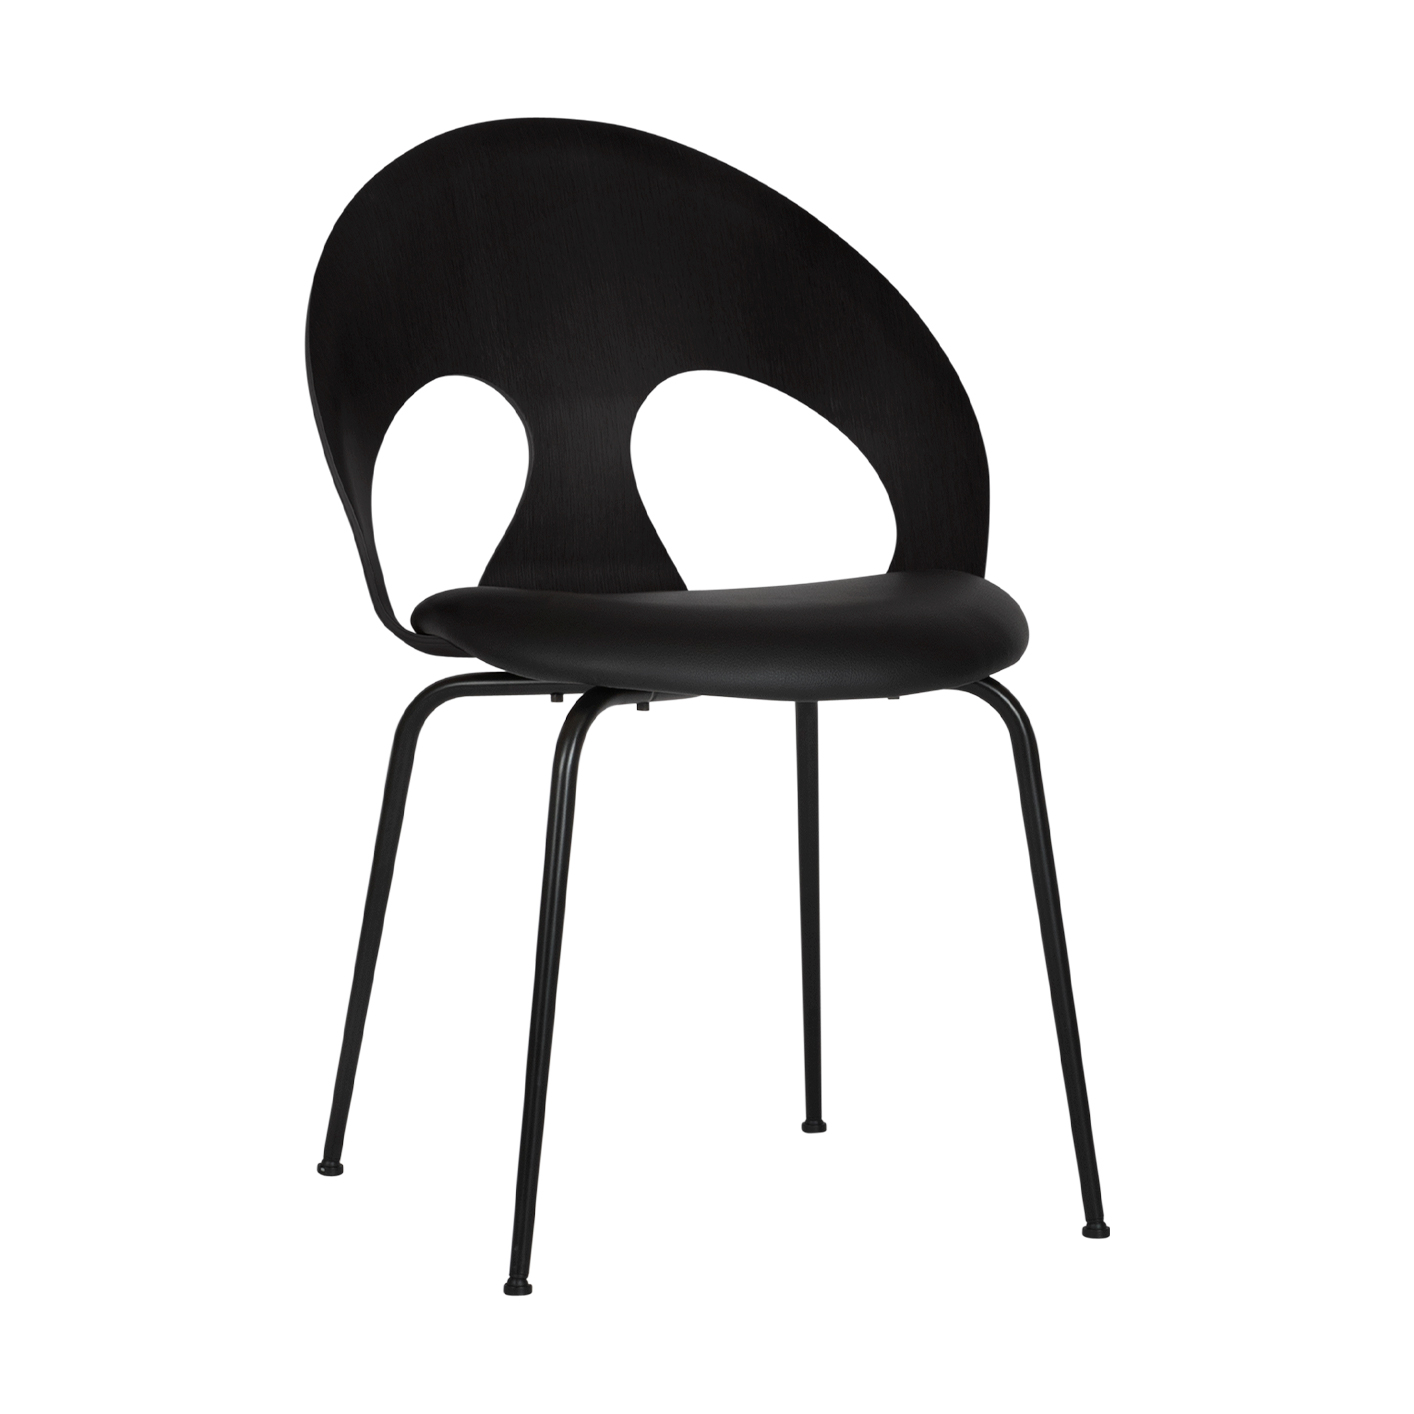 VERMUND – Eye Chair VL1100